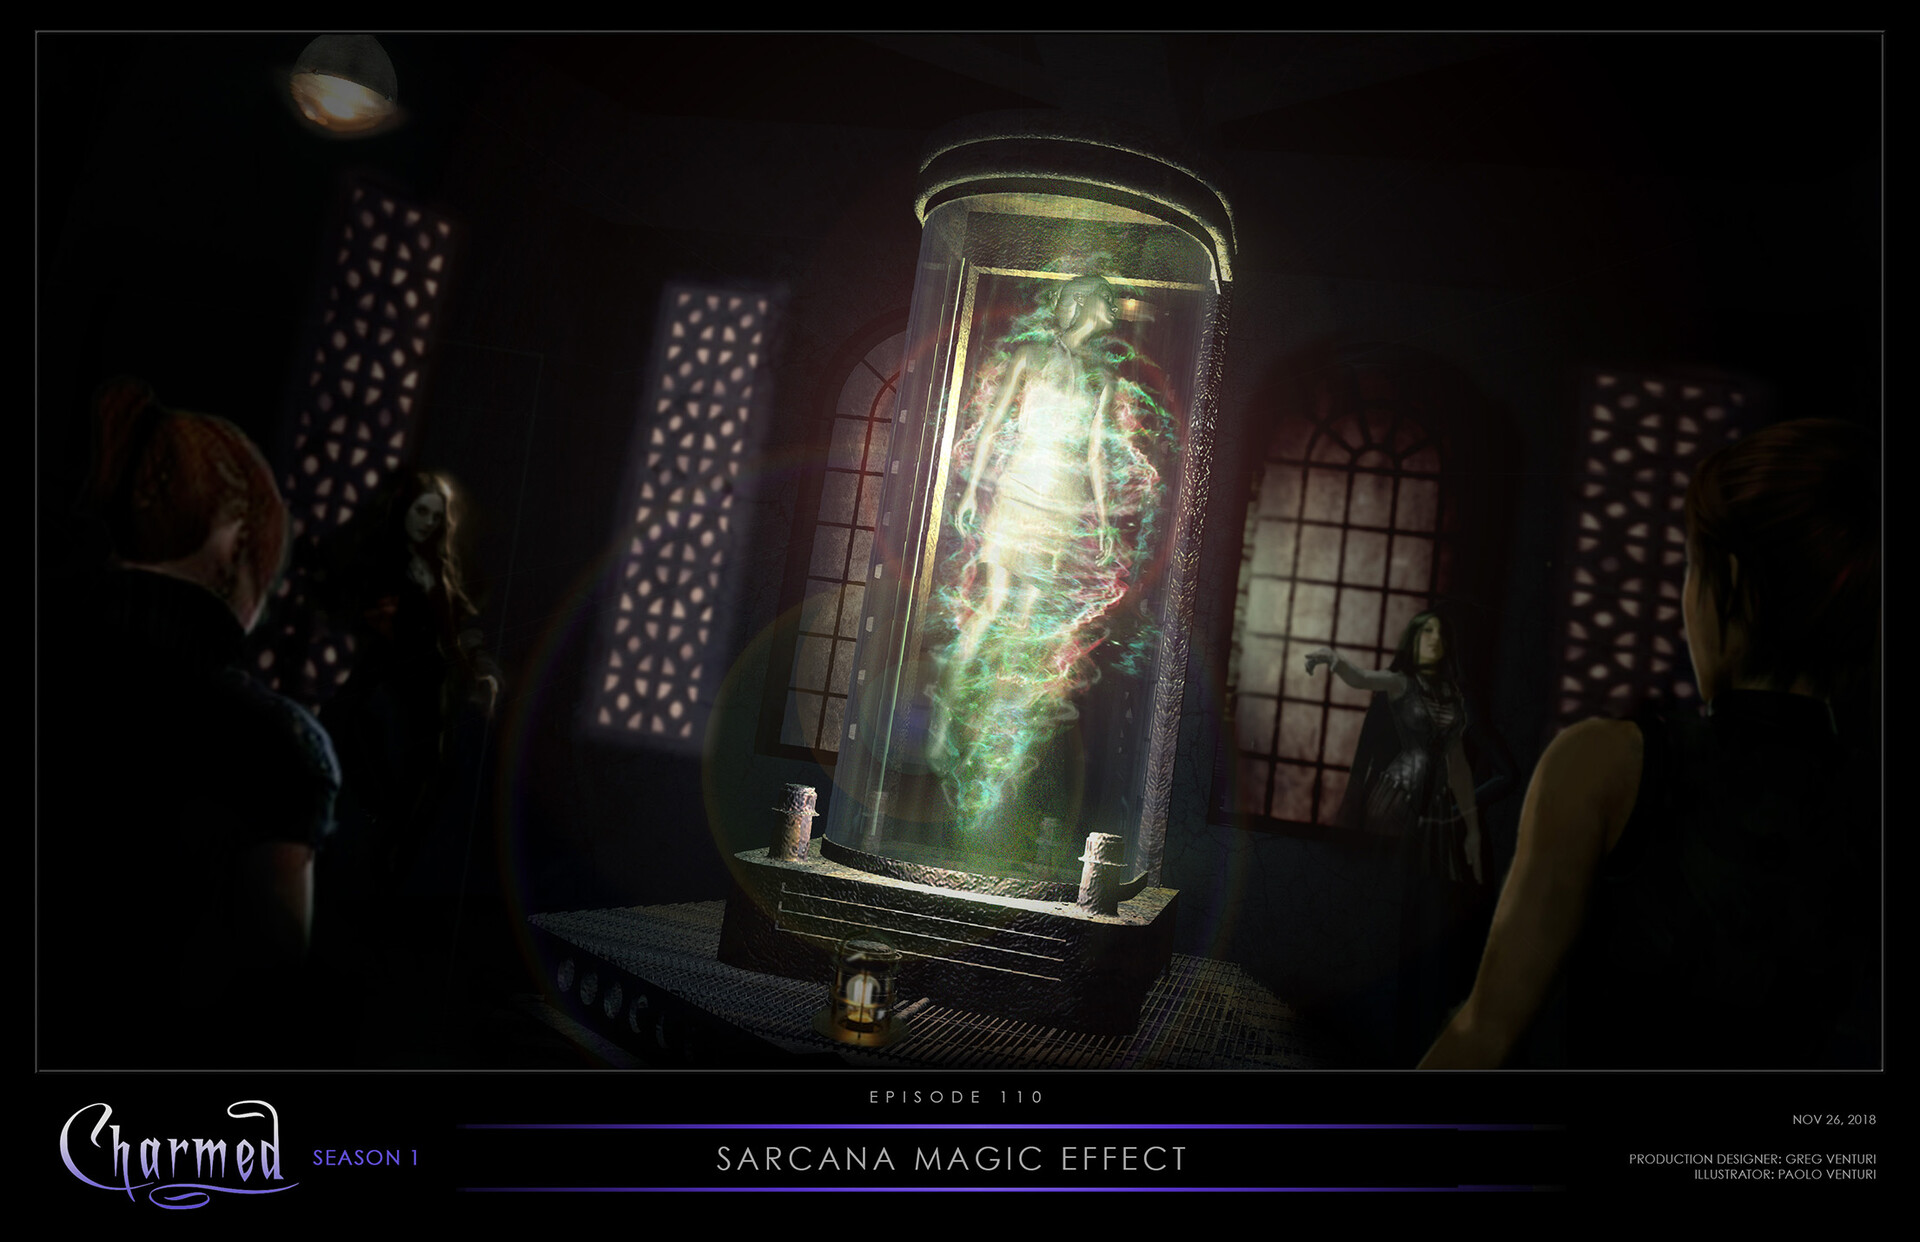 Sarcana Chamber / Charmed Season 1